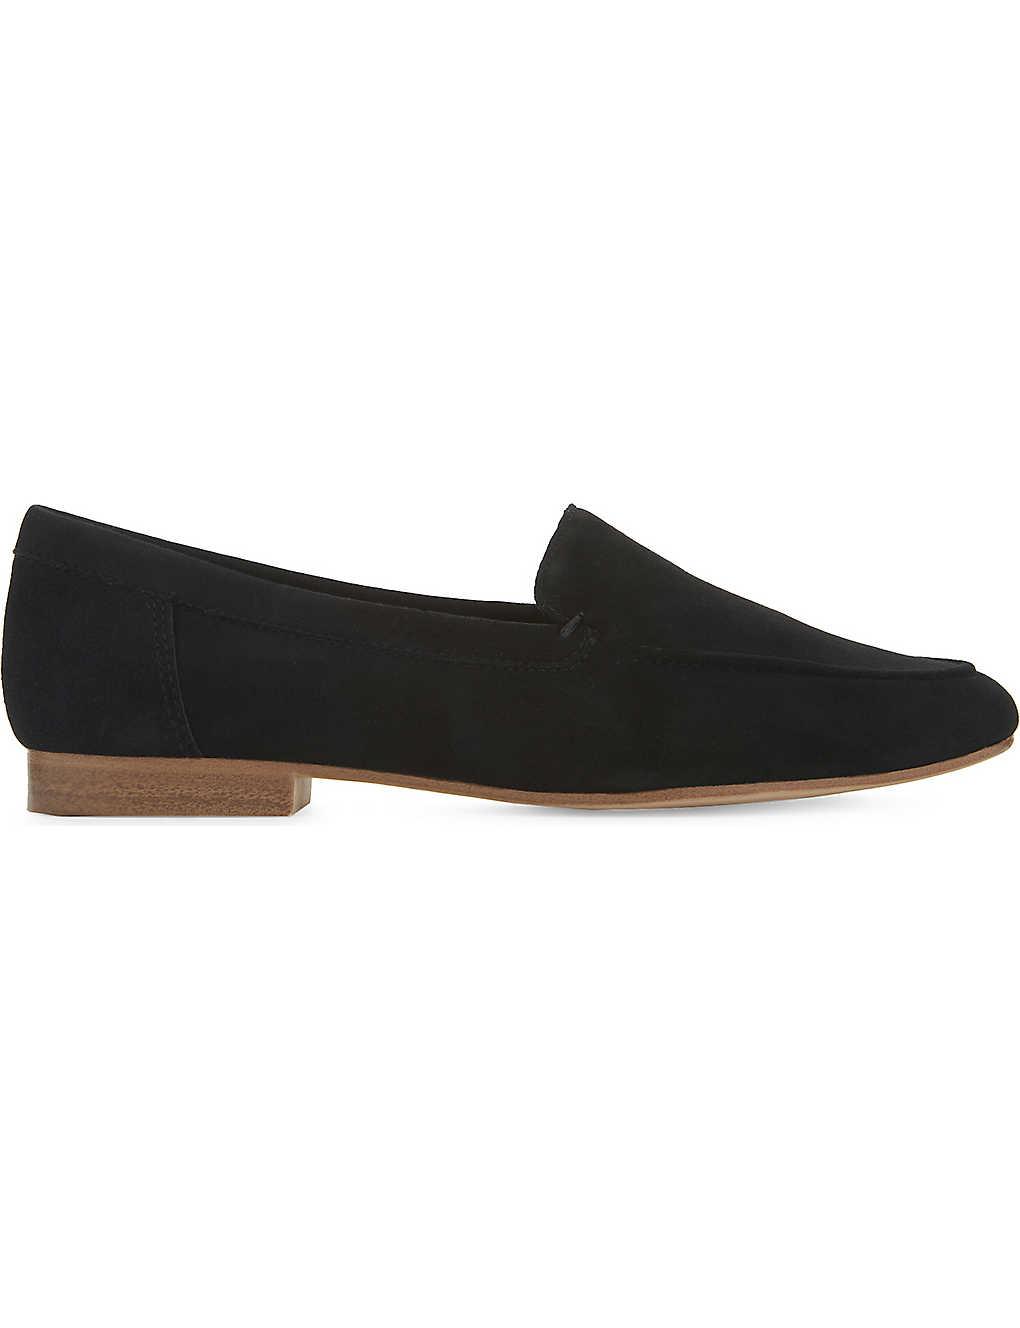 14e03ea653c ALDO - Joeya suede loafers